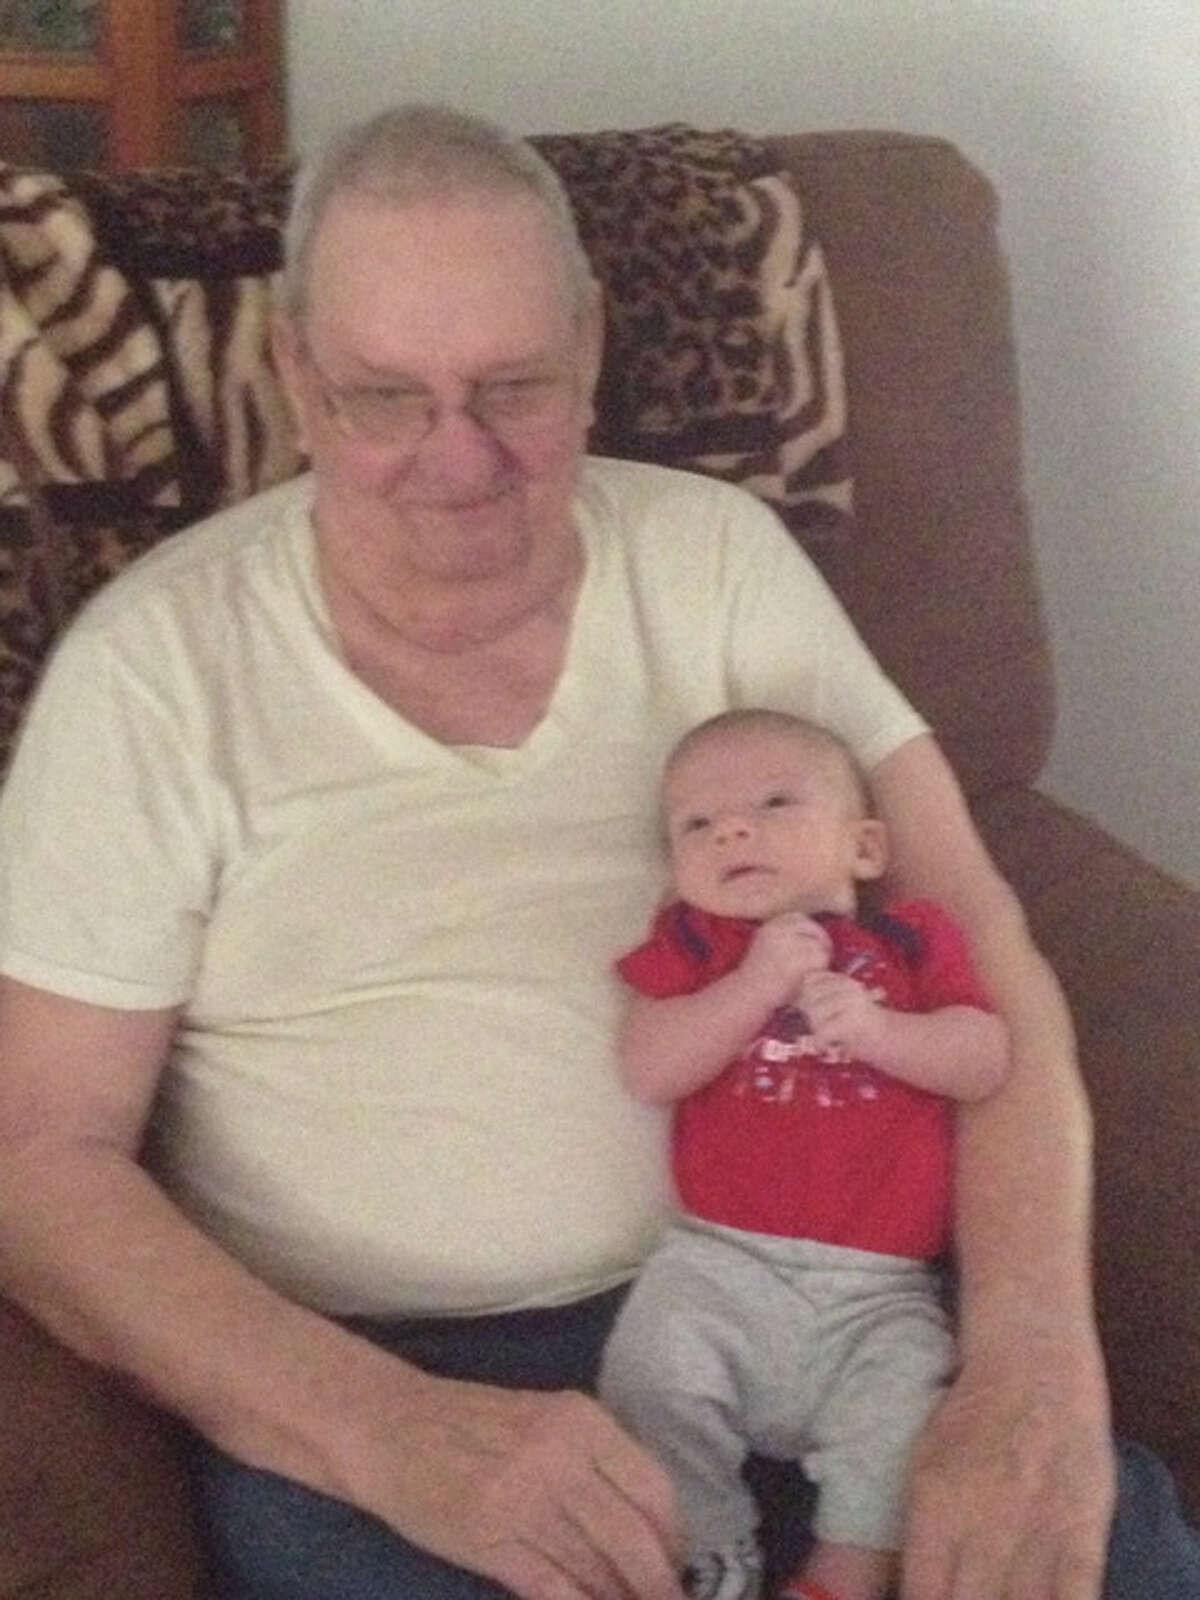 Charles Schneider, 81, vanished Wednesday morning. (Stafford police)